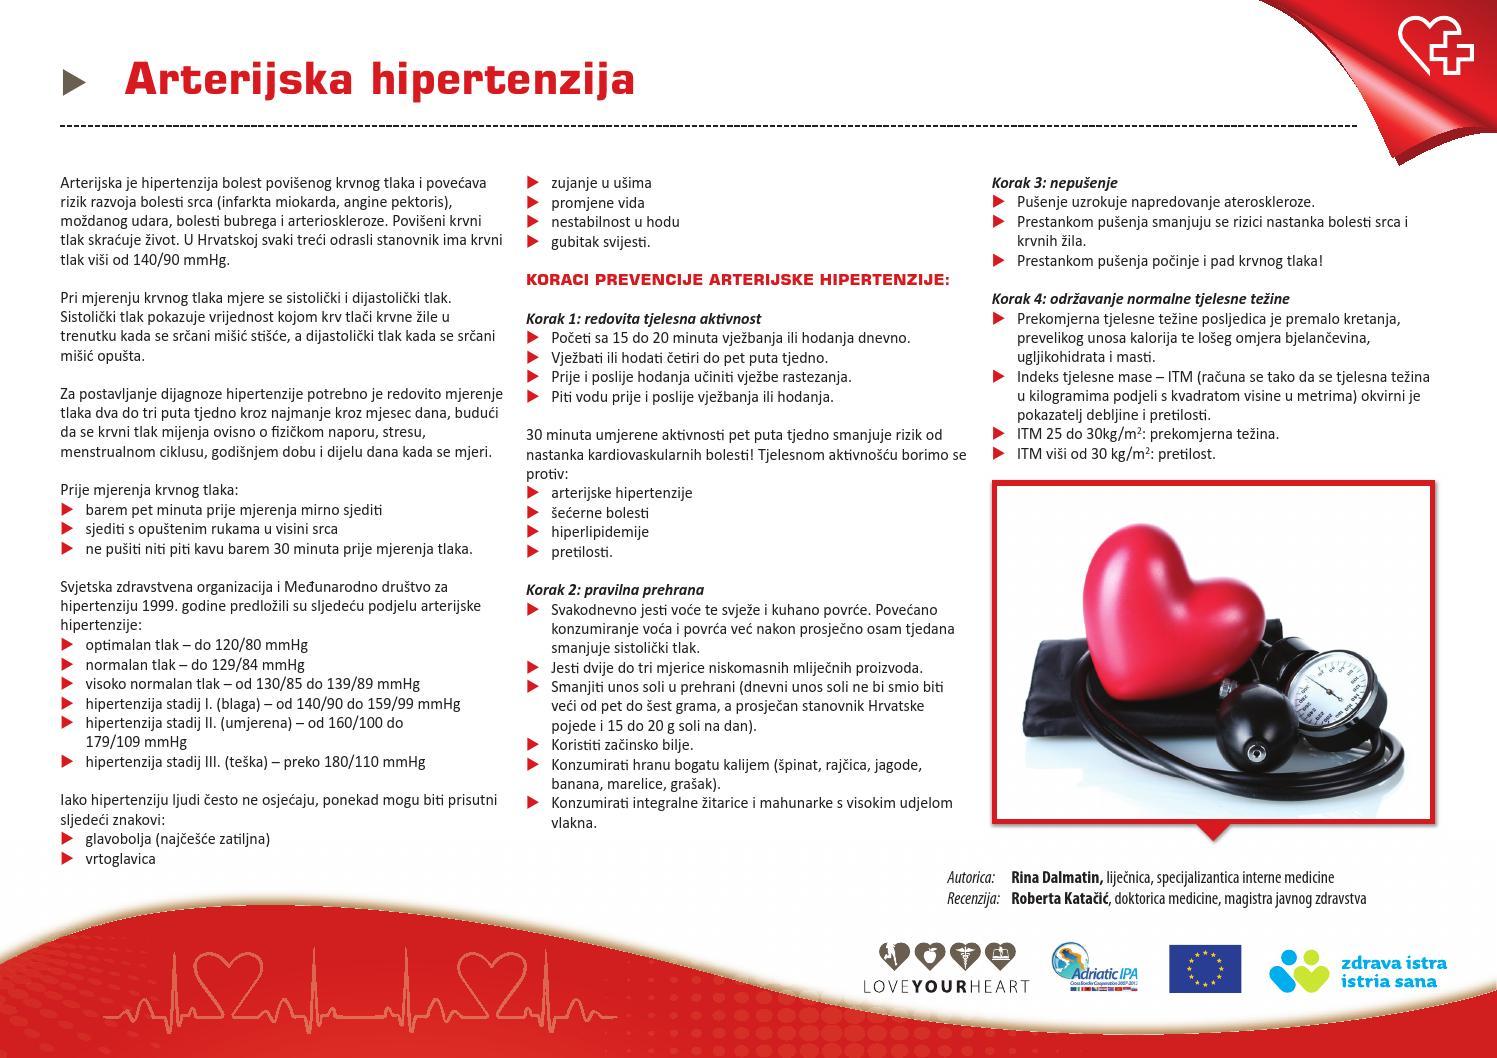 hipertenzije i detraleks